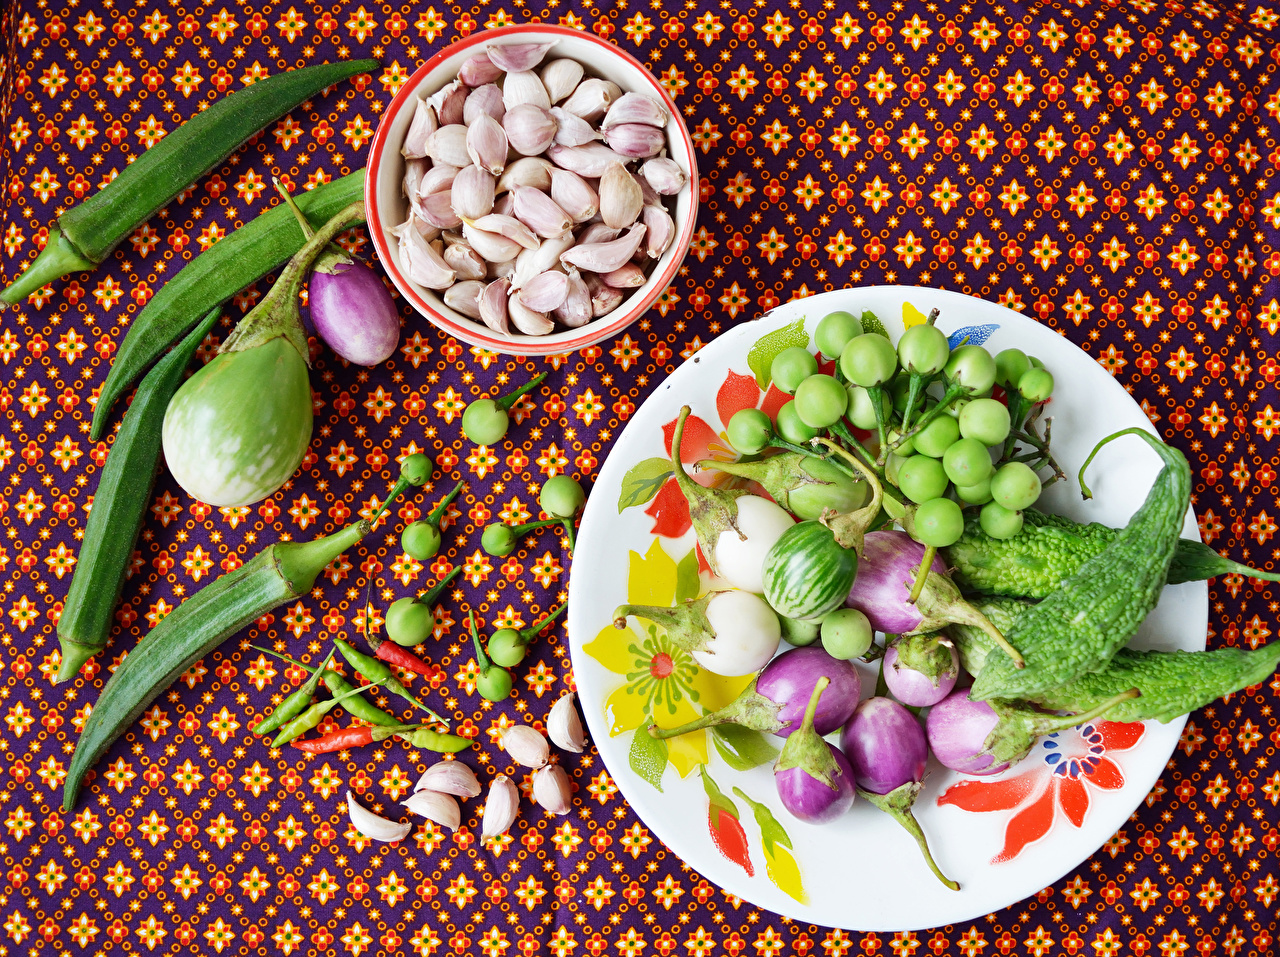 Картинка Баклажан Чеснок Еда Овощи Перец тарелке Пища Тарелка перец овощной Продукты питания